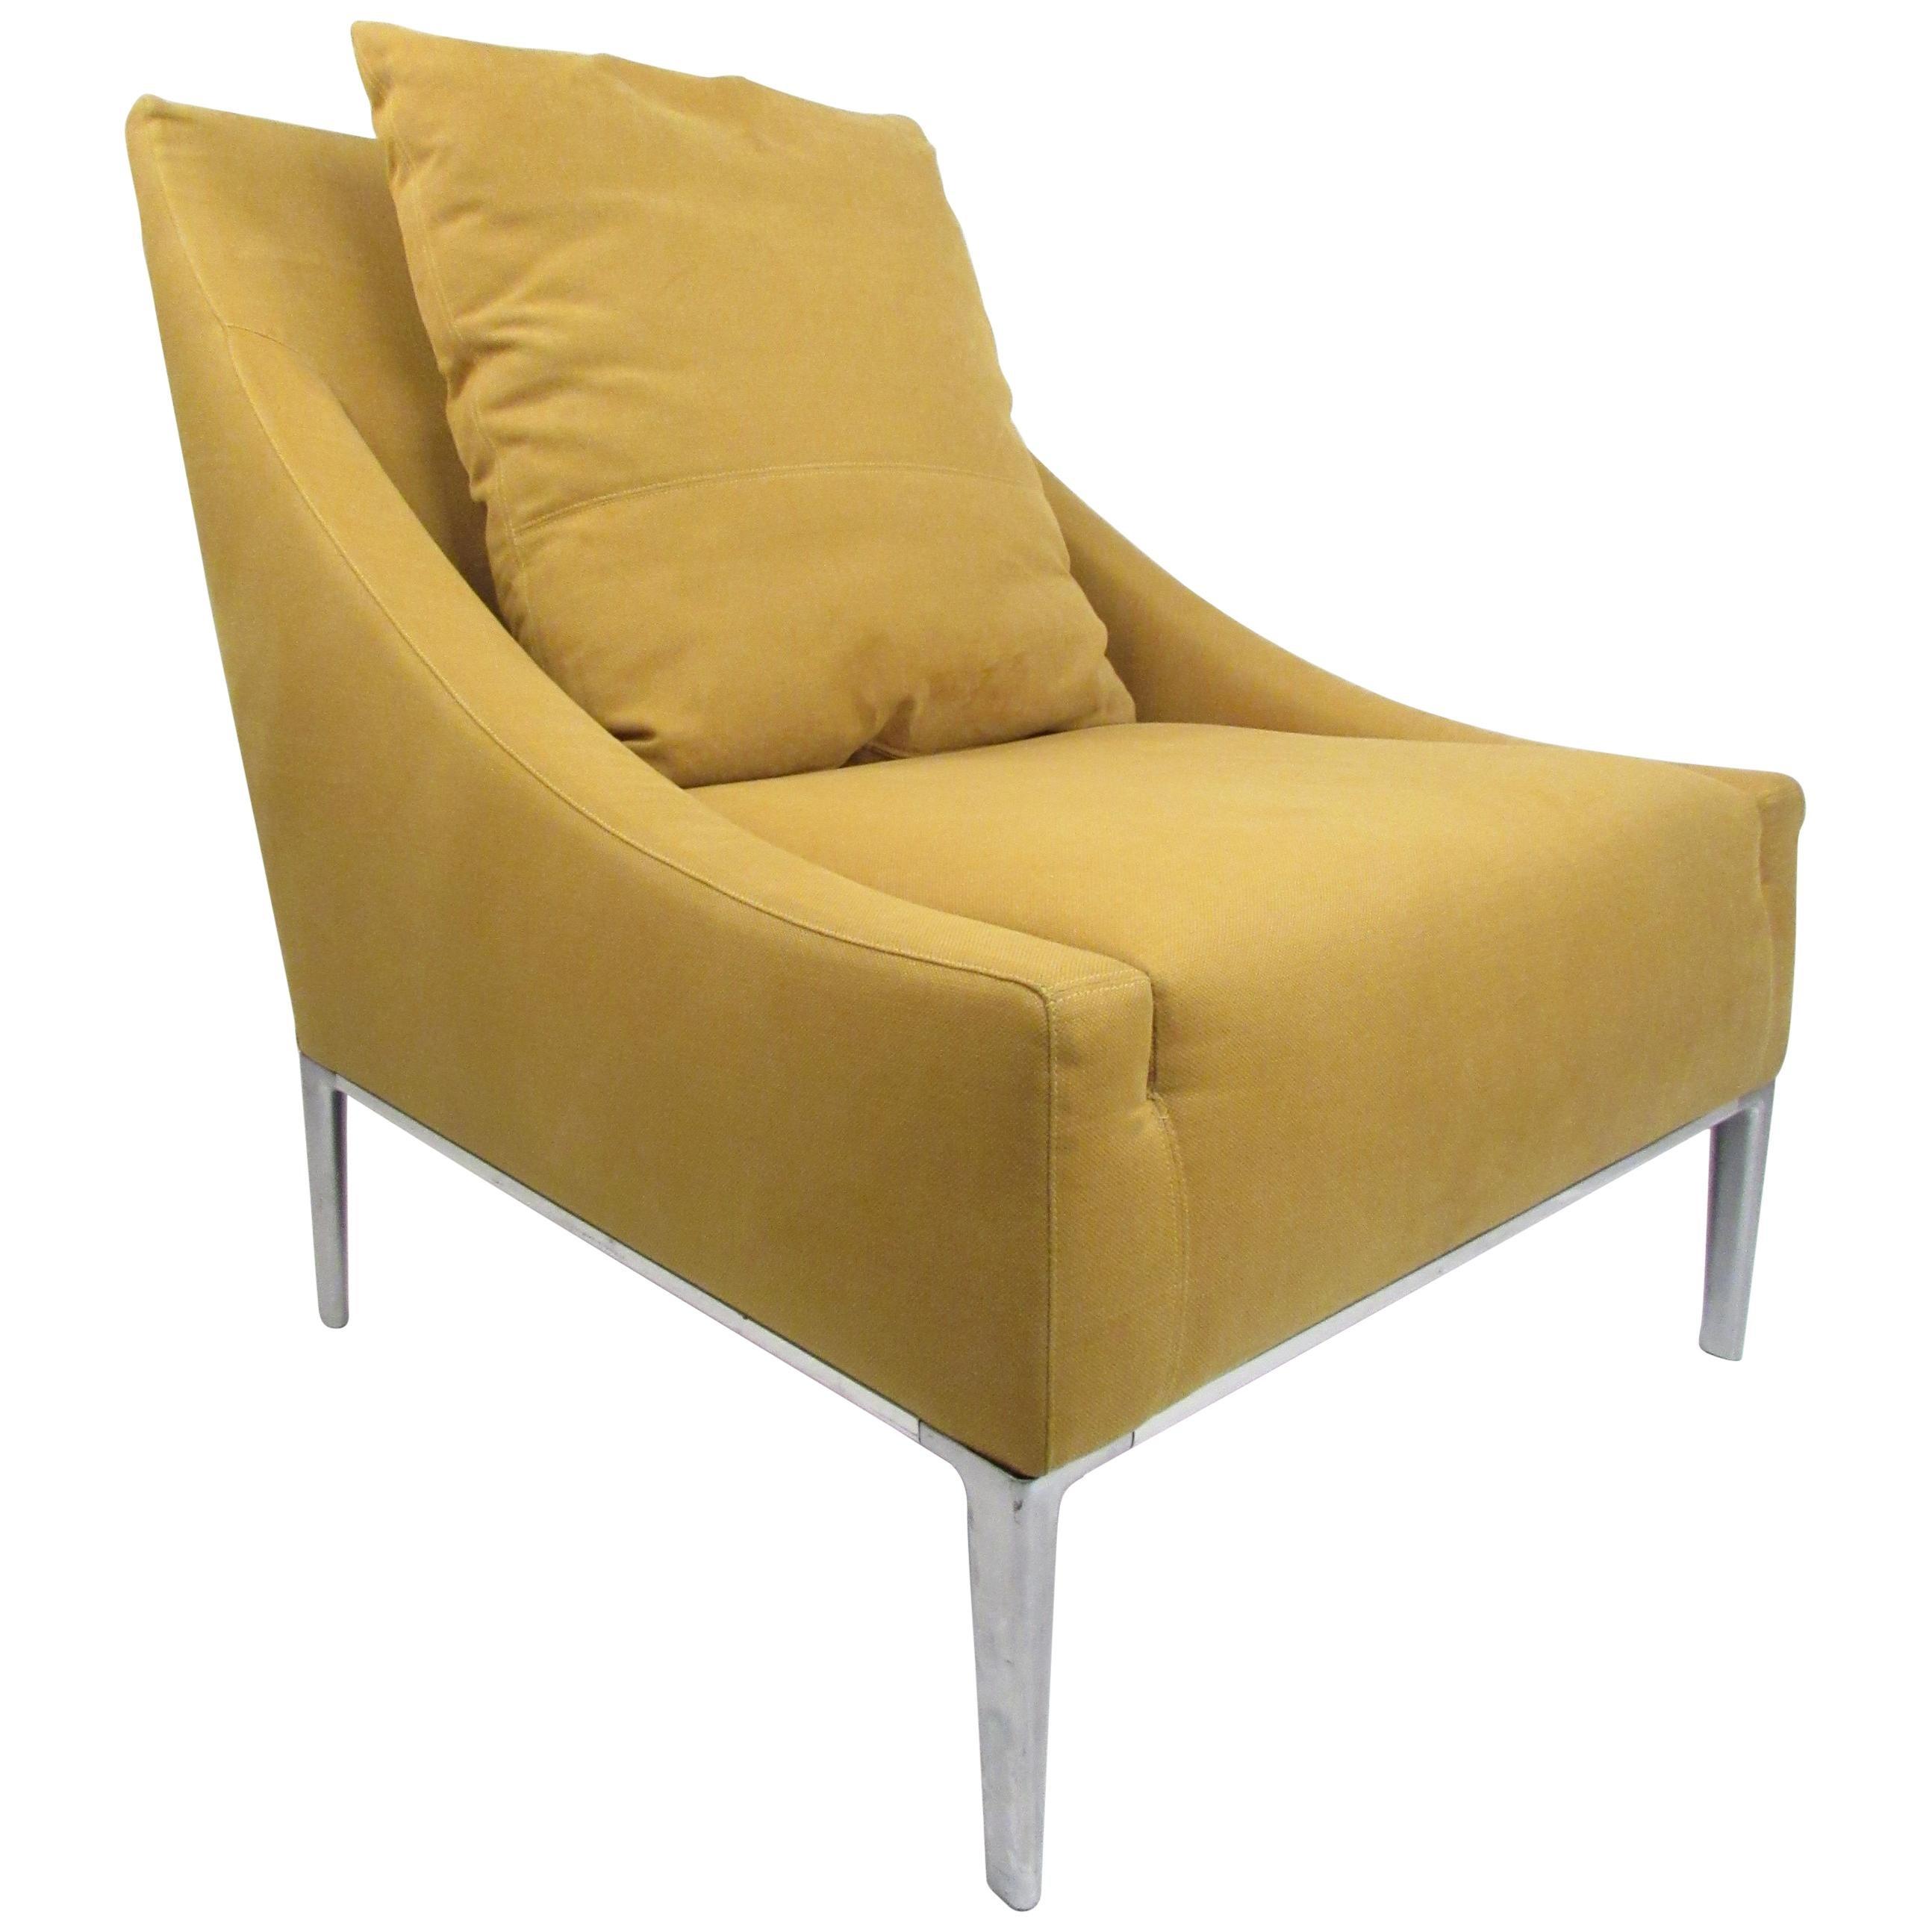 Contemporary Modern Italian Lounge Chair by Antonio Citterio